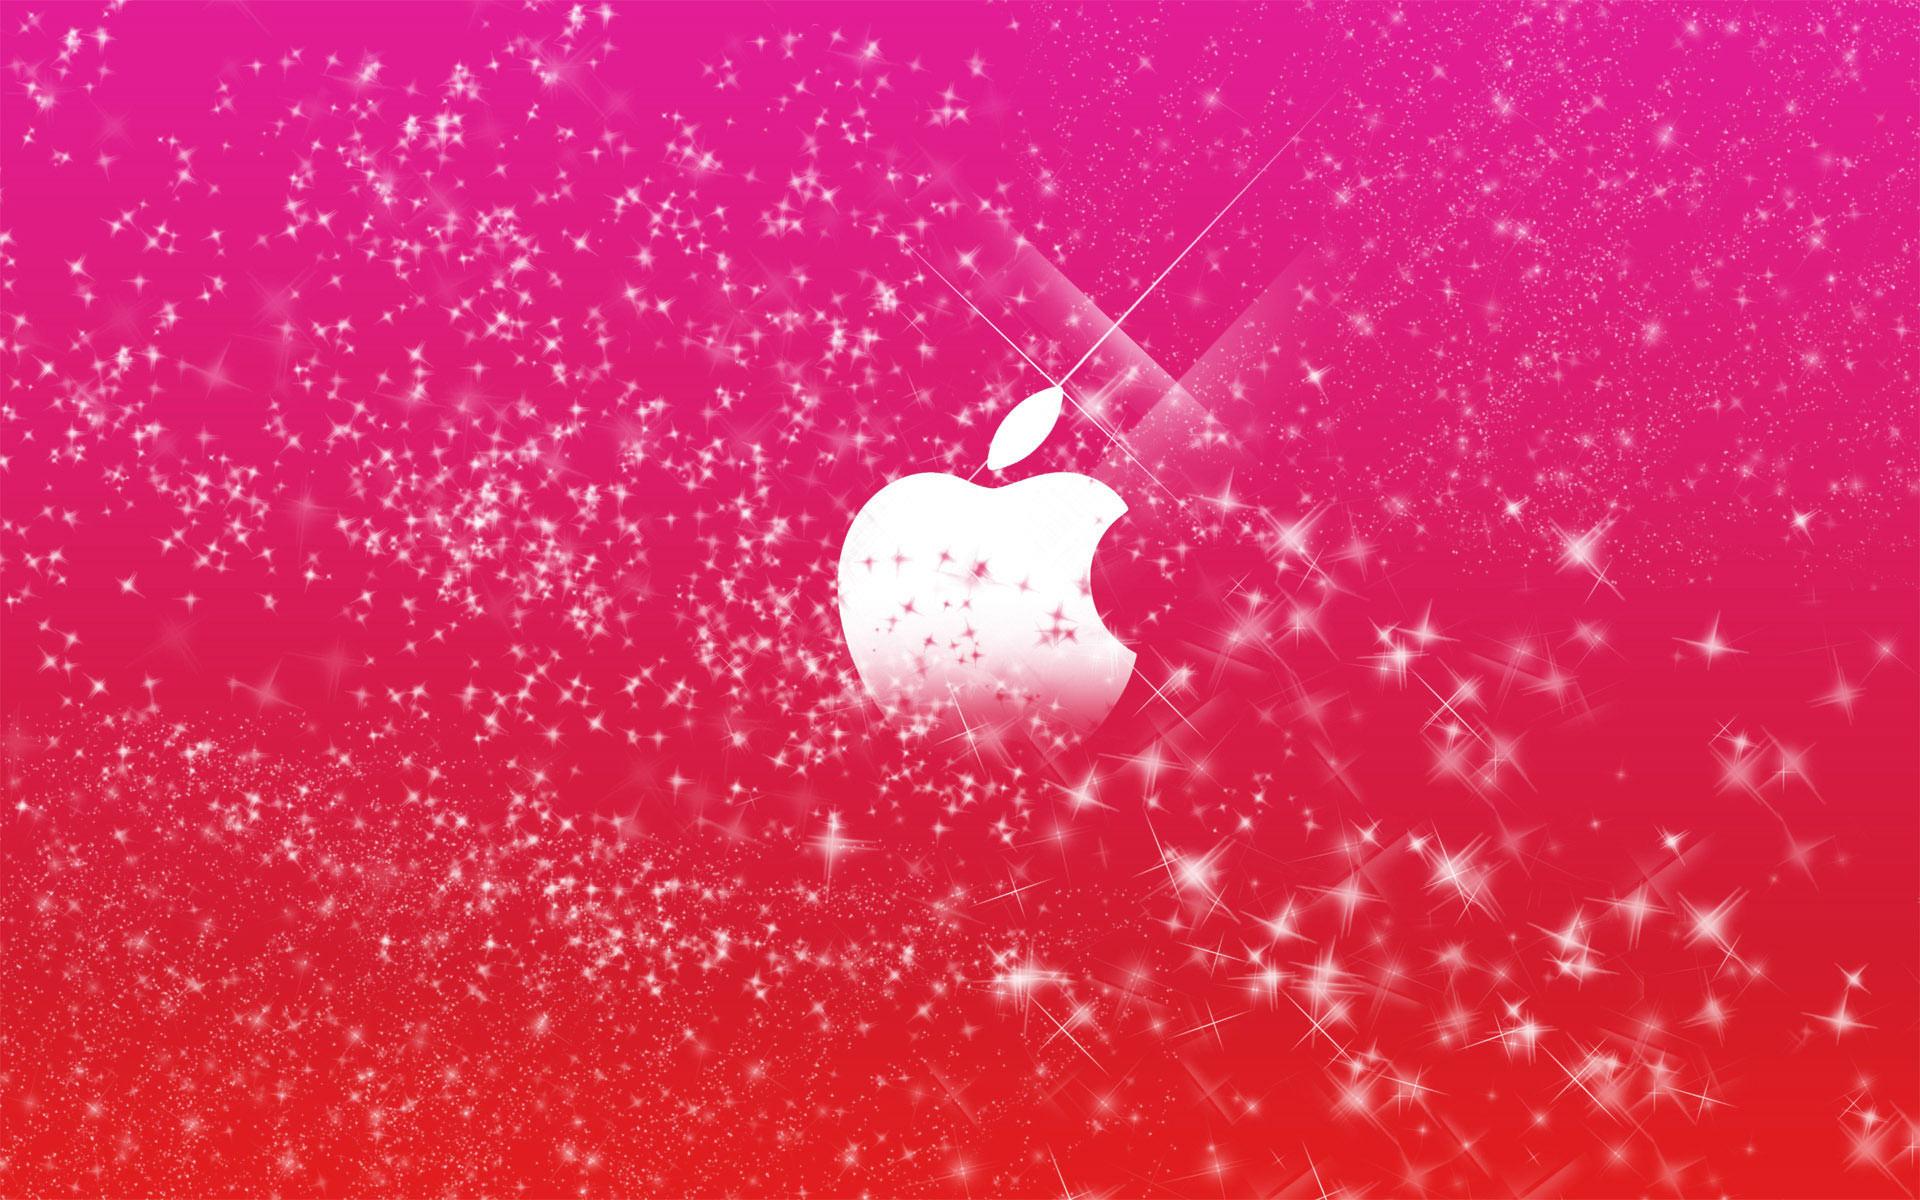 Pretty Pink Wallpaper for Desktop 58 images 1920x1200